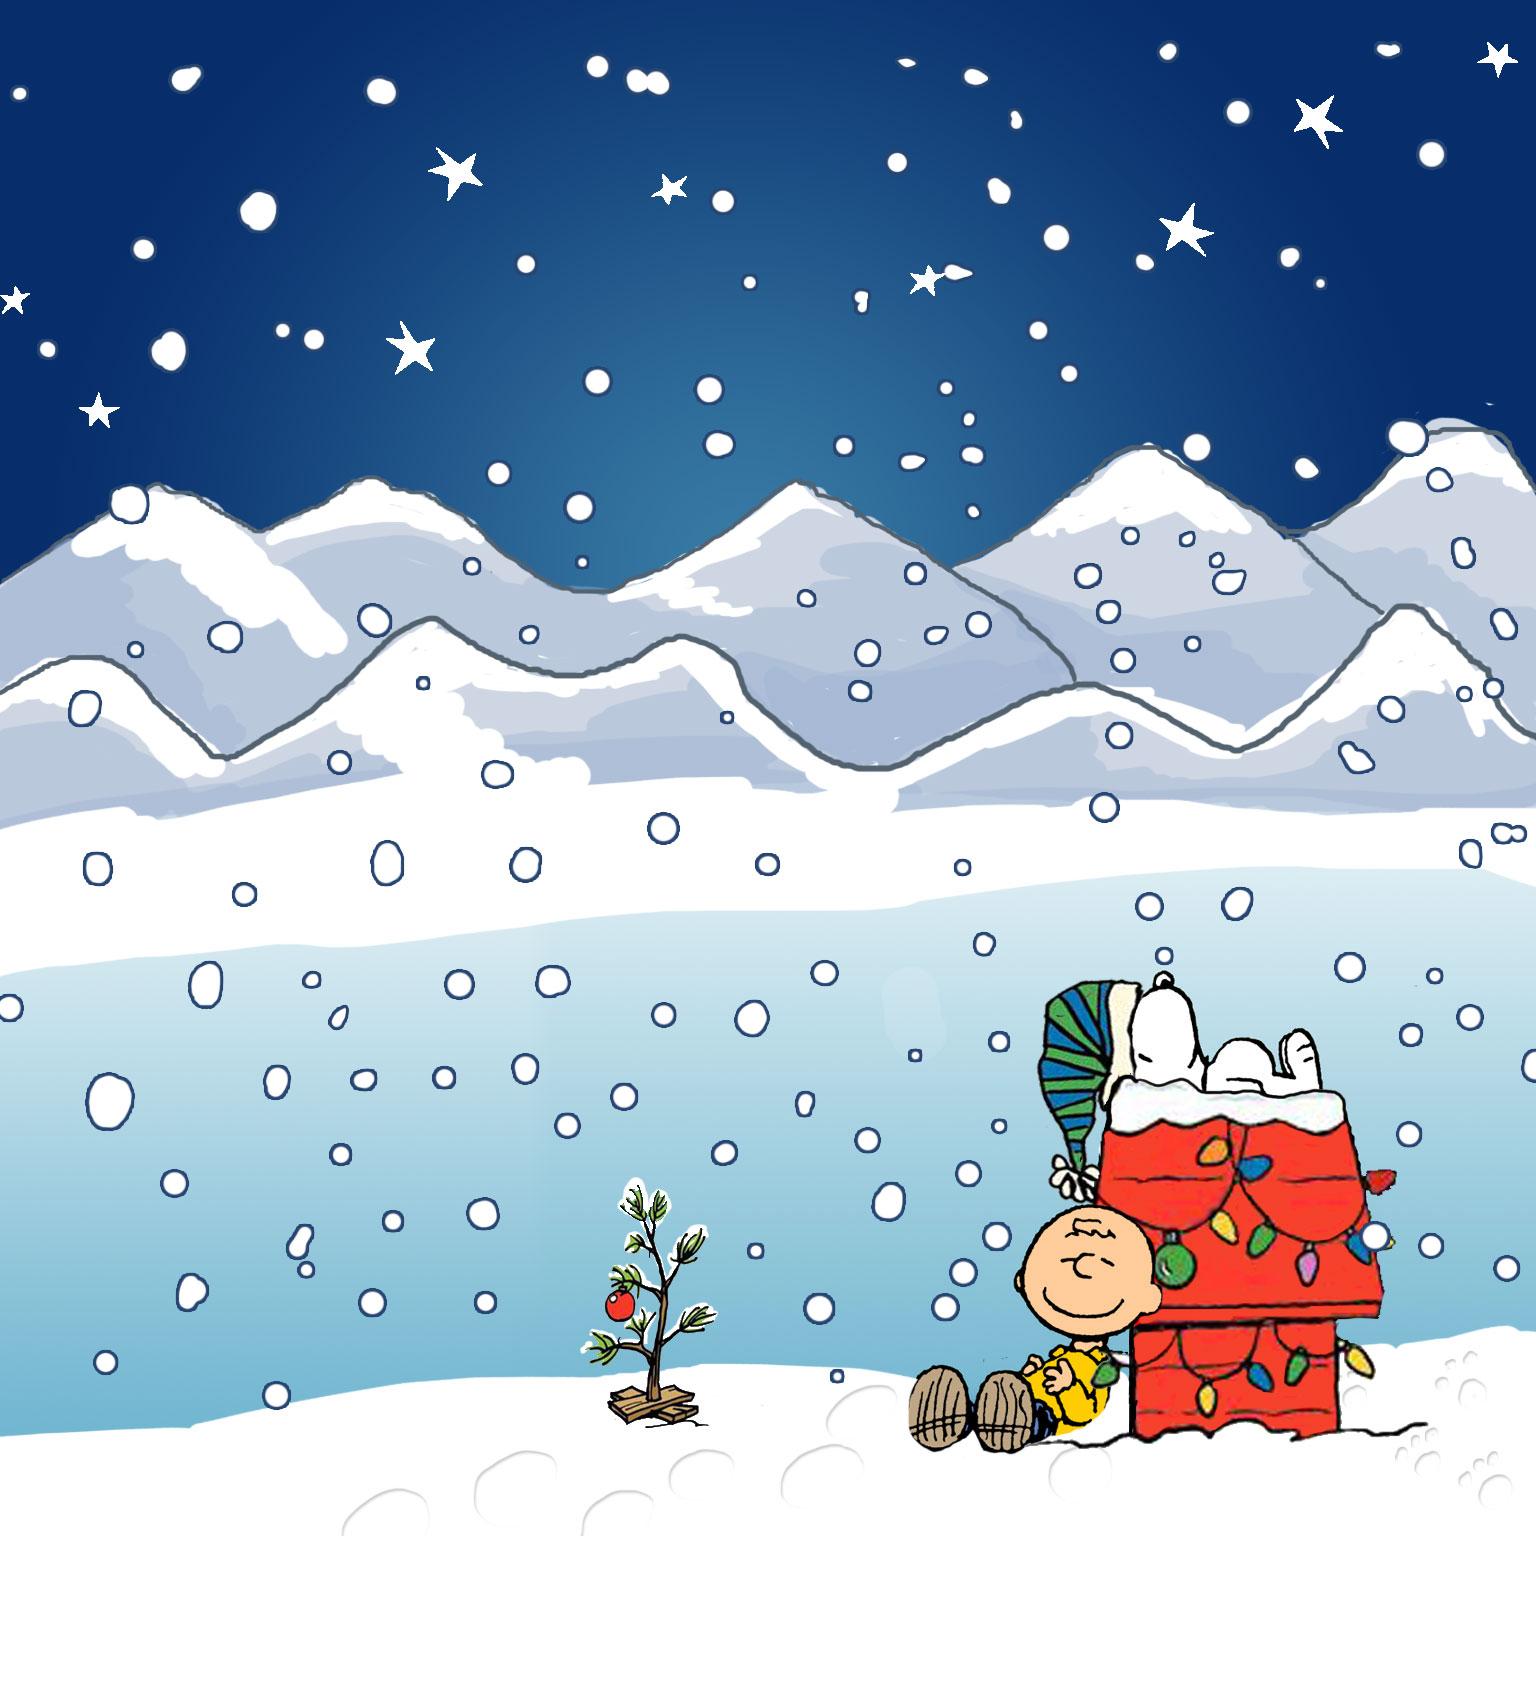 FREE CHARLIE BROWN CHRISTMAS WALLPAPER 1536x1703